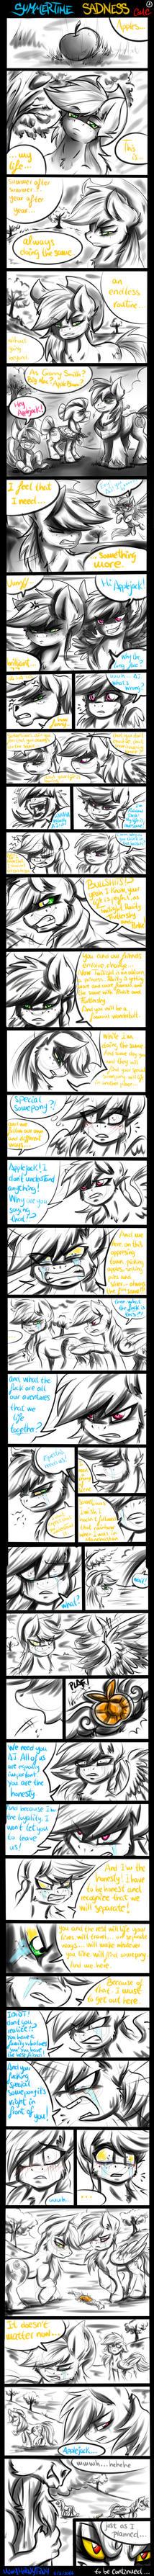 Summertime  Sadness Comic1 (AppleDash) by Mimy92Sonadow